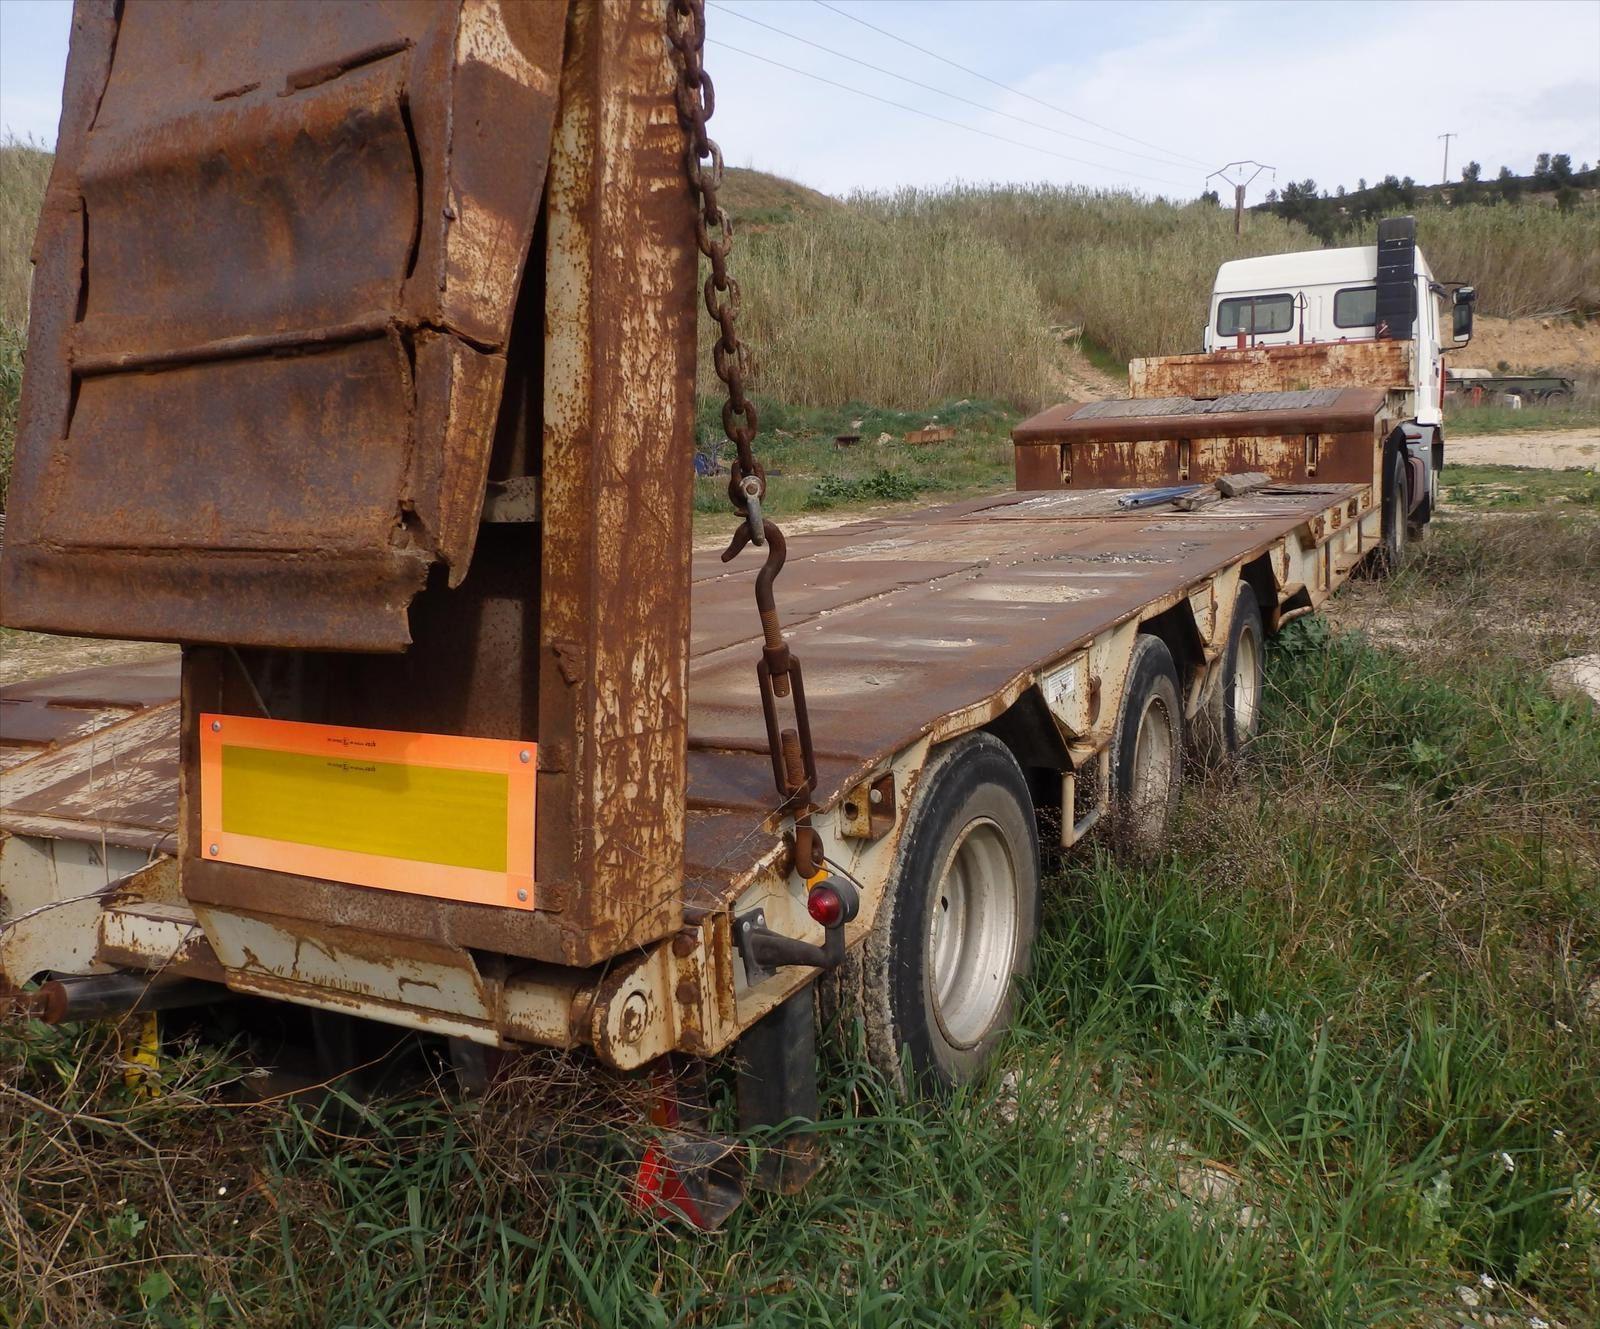 Tracteur Routier Renault G340 EXPORT Porte char KAISER 0608066192 TransComm13 Pierre BASSAT